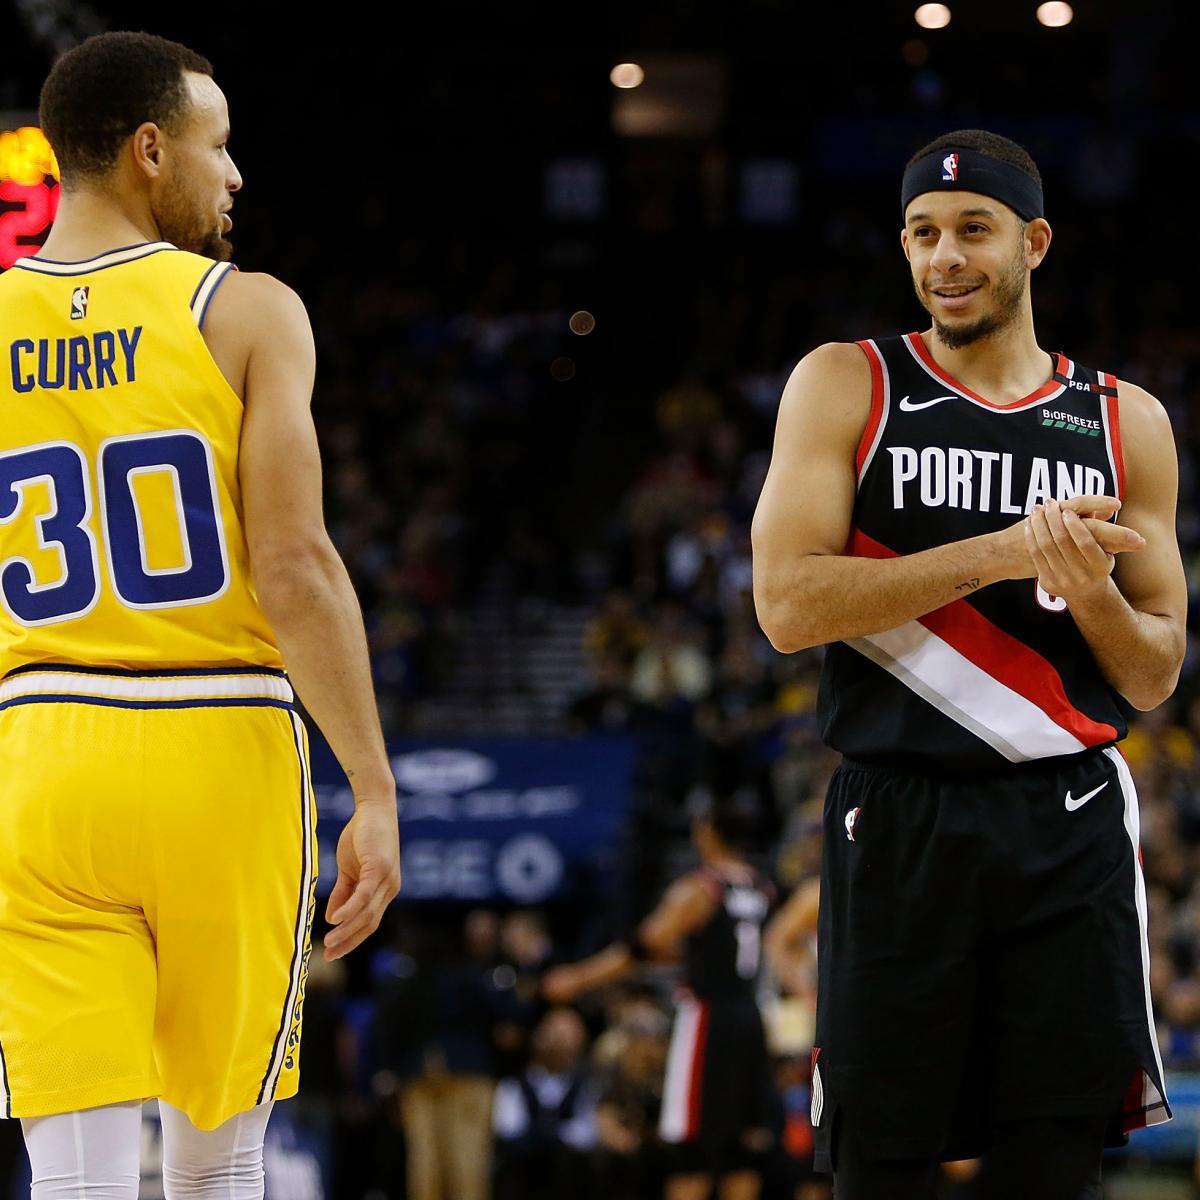 Nba Stephen Curry: NBA 3-Point Contest 2019: Stephen Curry, Damian Lillard